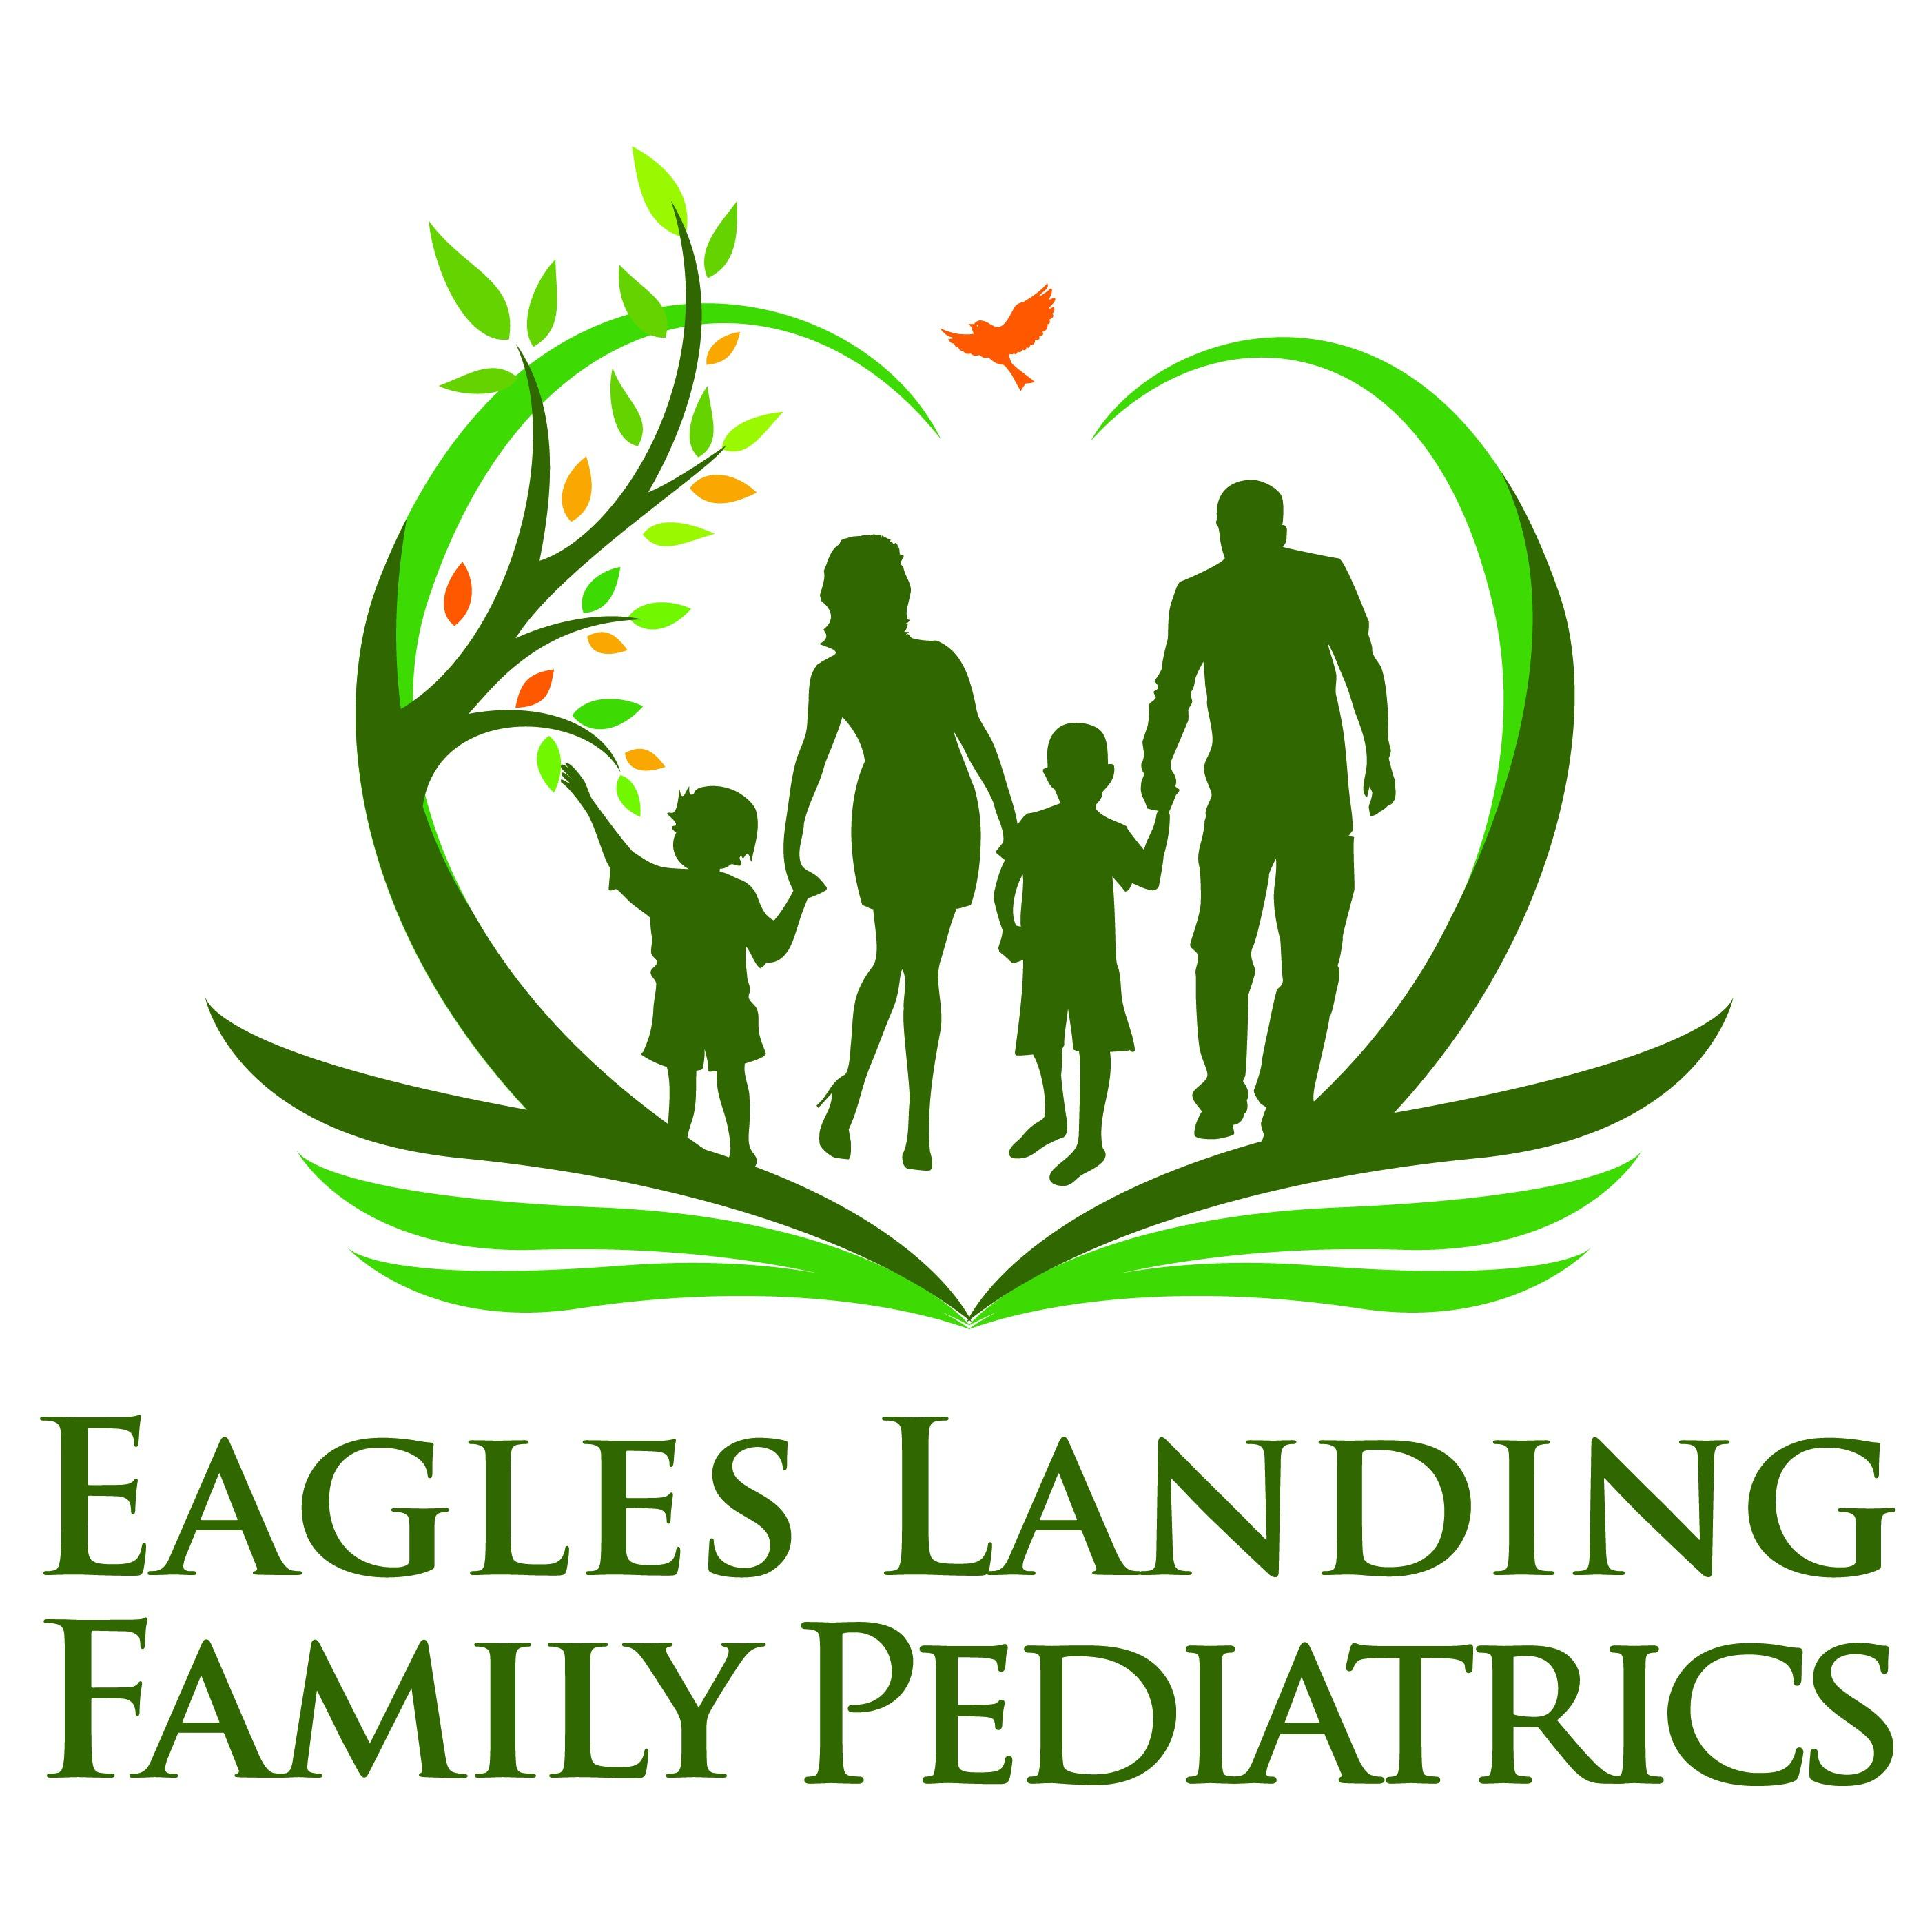 Eagles Landing Family Pediatrics